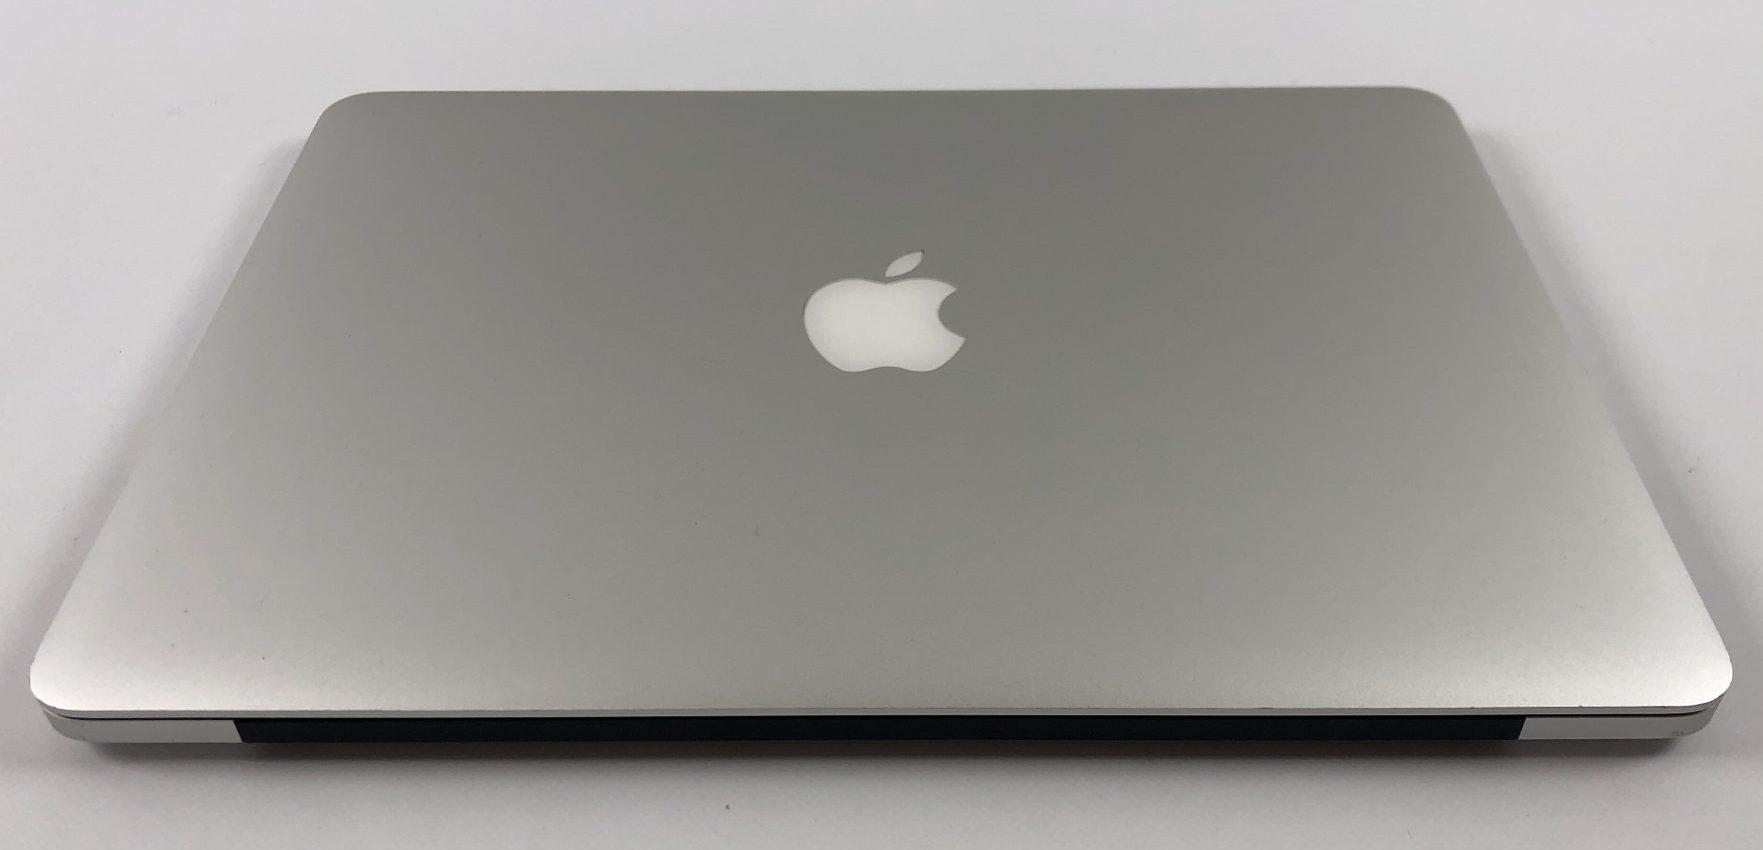 "MacBook Pro Retina 13"" Mid 2014 (Intel Core i7 3.0 GHz 16 GB RAM 512 GB SSD), Intel Core i7 3.0 GHz, 16 GB RAM, 512 GB SSD, bild 2"